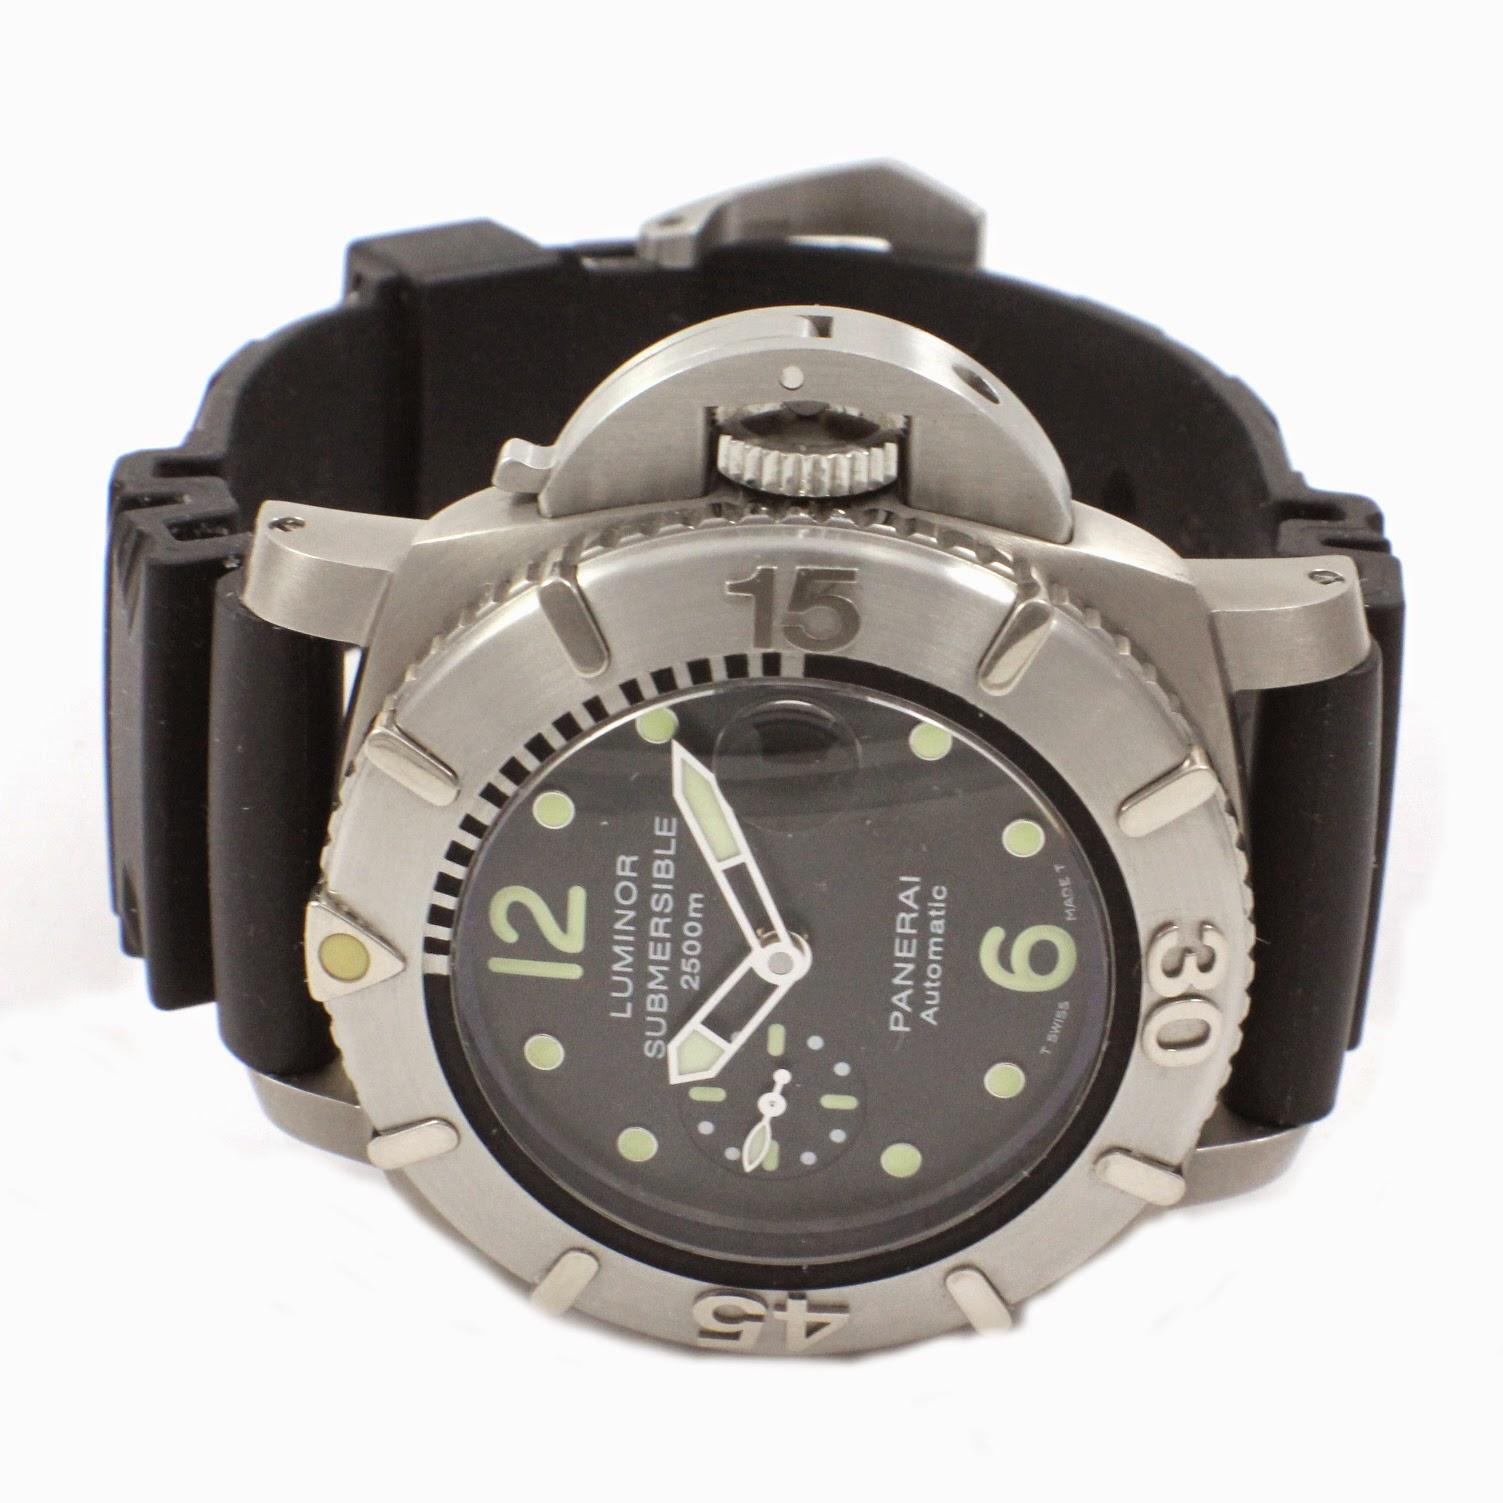 Swiss design watches 250 limited edition panerai - Panerai dive watch ...